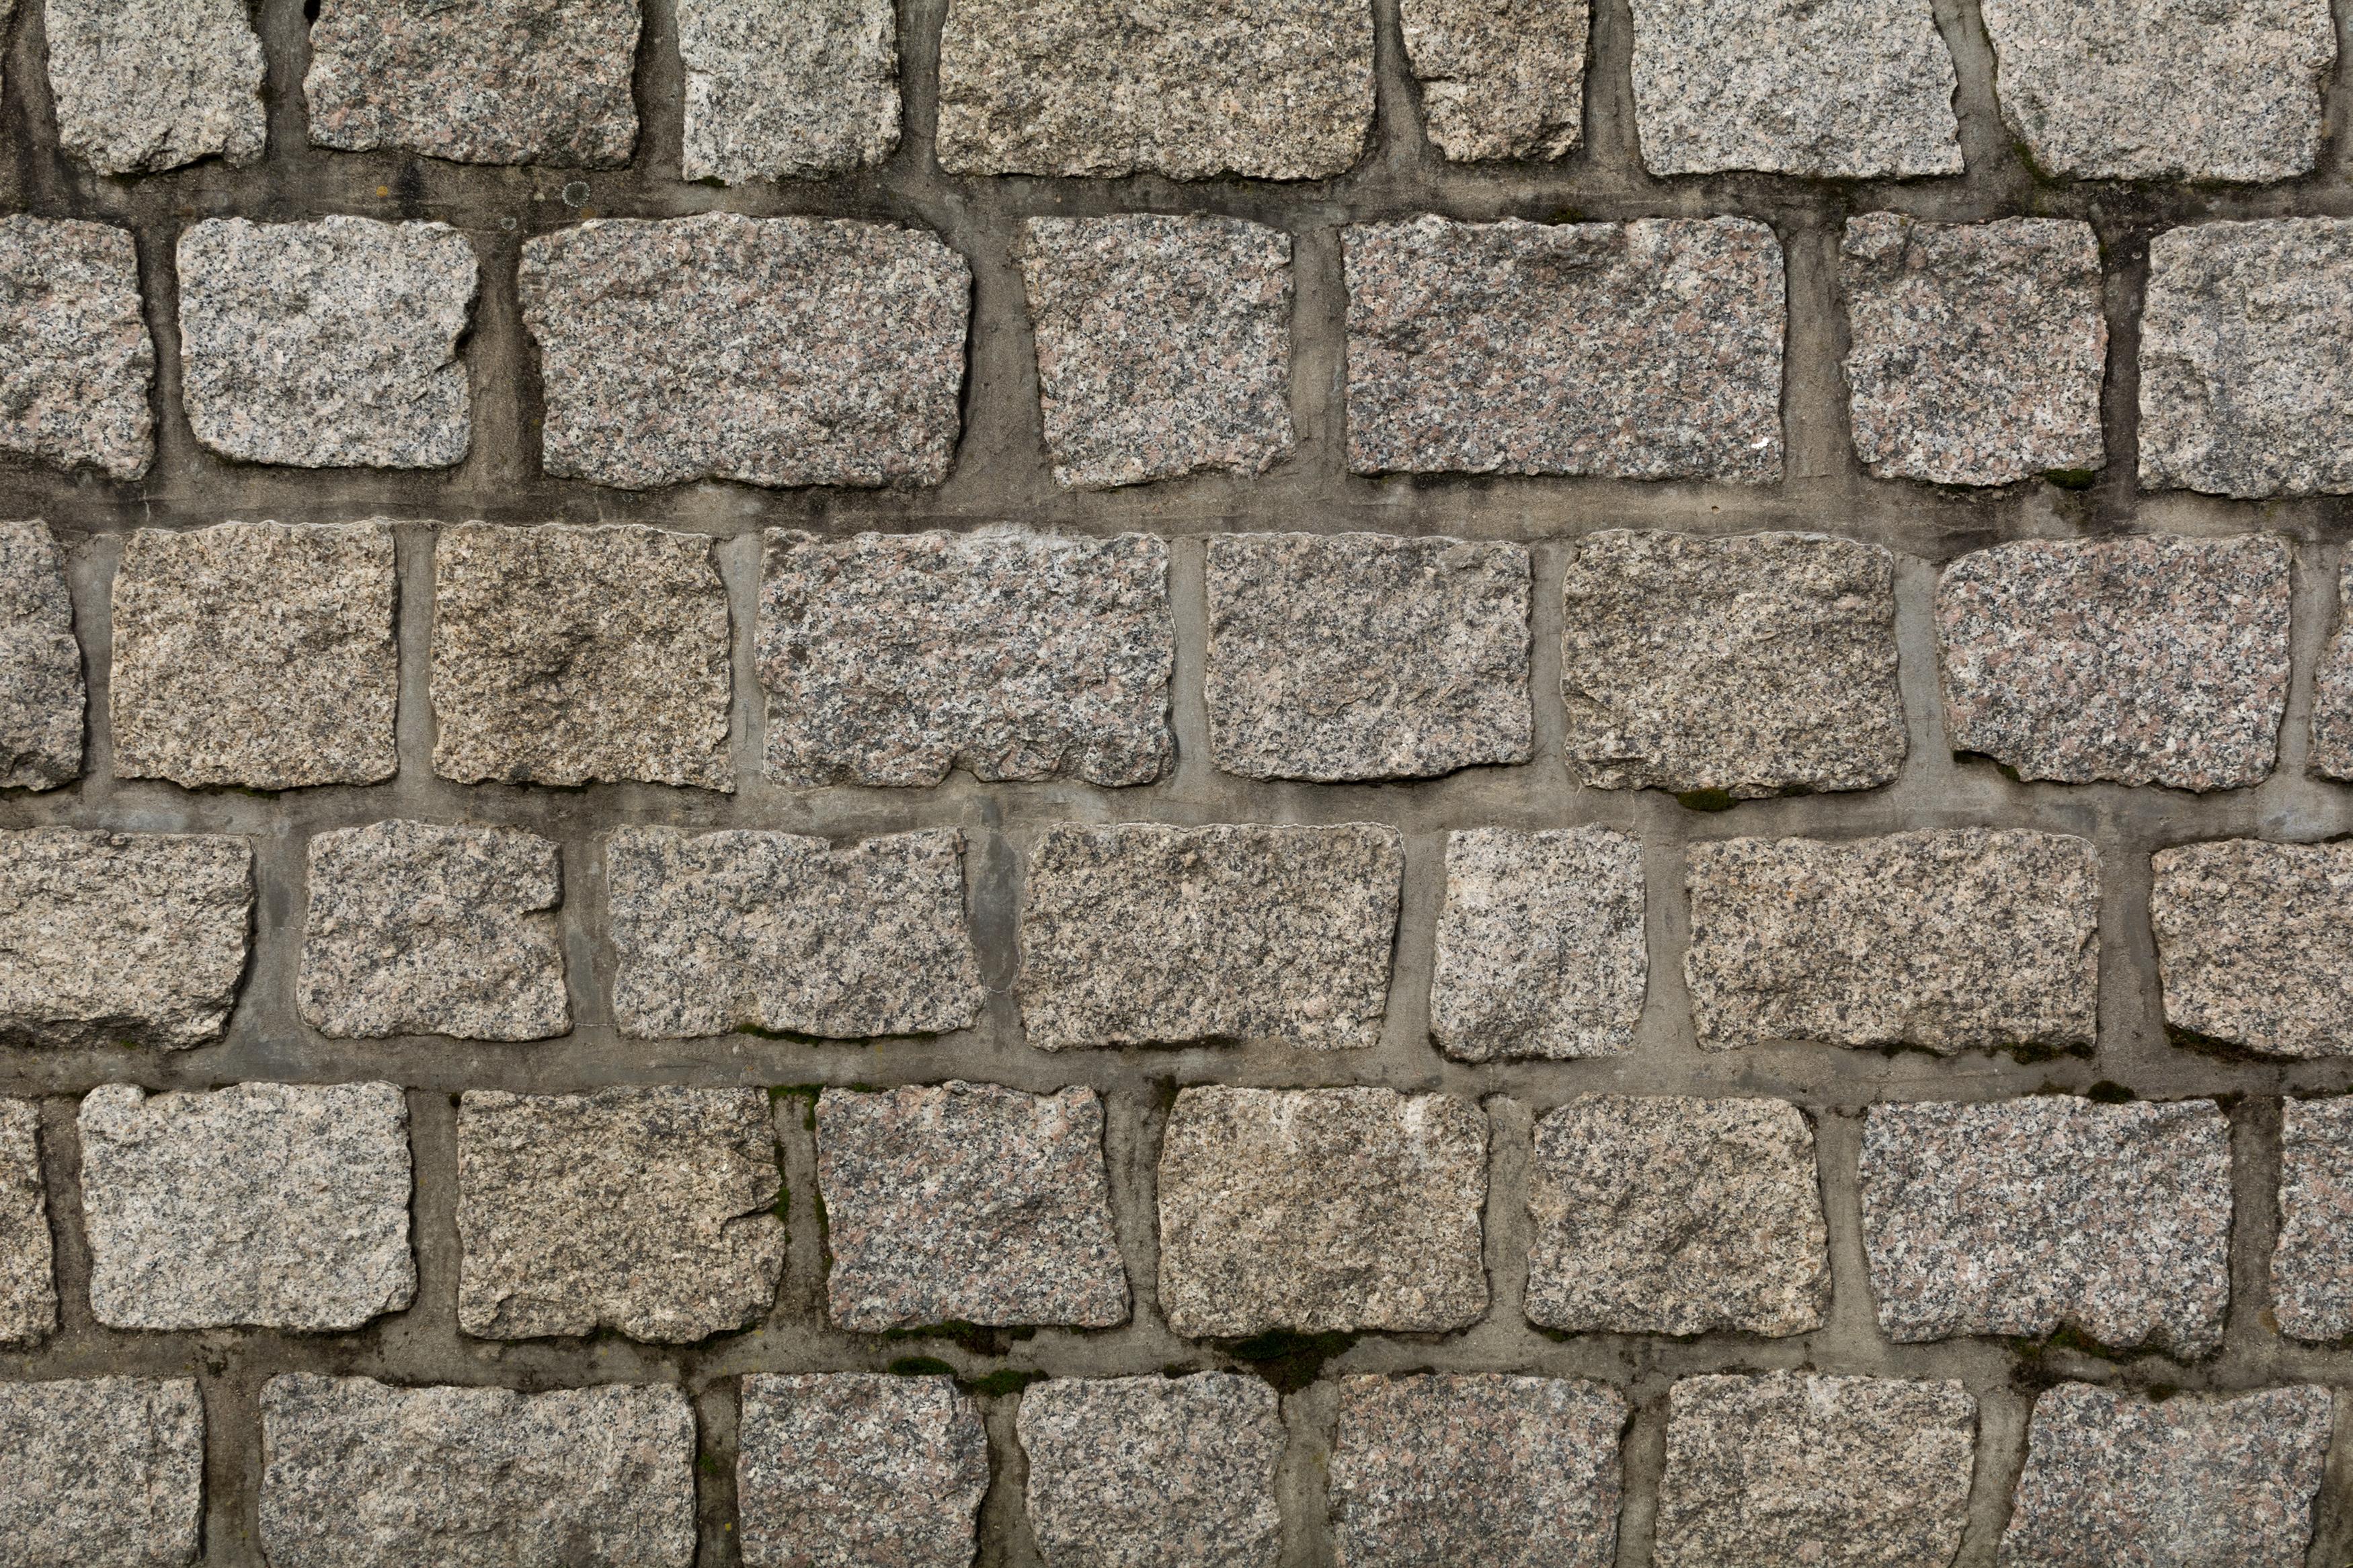 Gray Stone Wall : Free image gray stone wall texture libreshot public